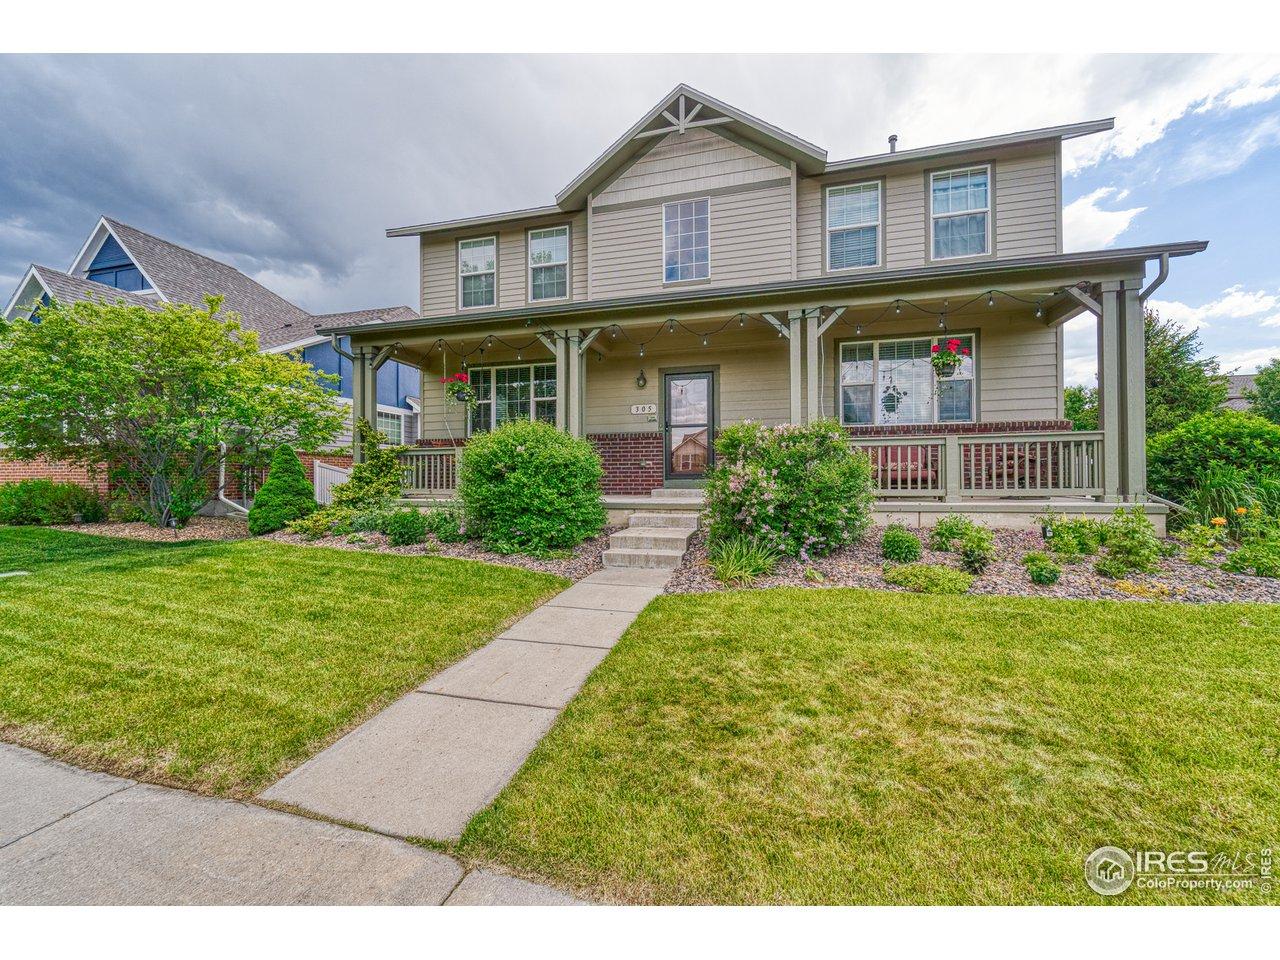 305 Homestead Pkwy, Longmont CO 80504